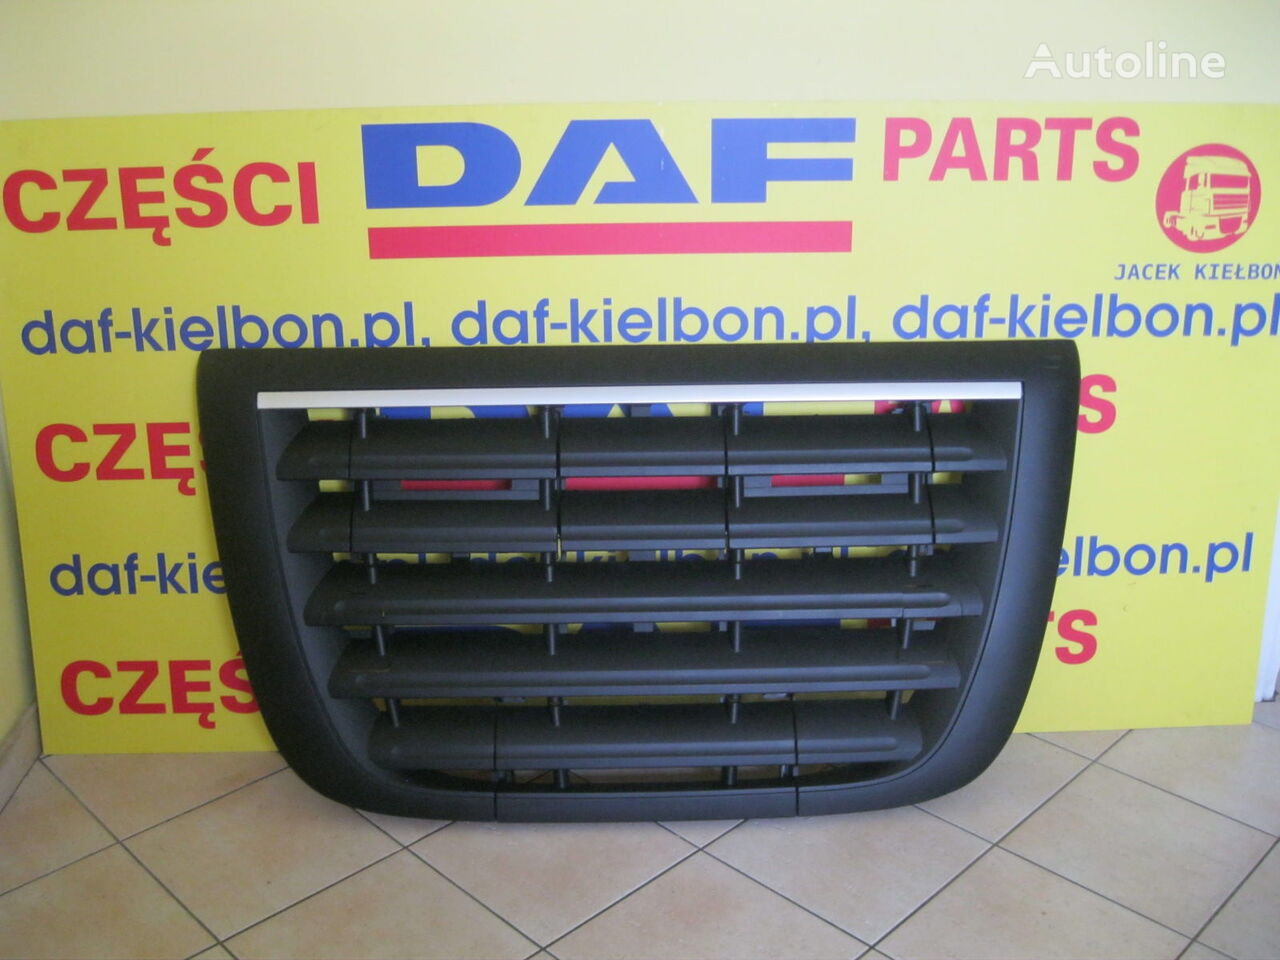 новый капот DAF GRILL для тягача DAF XF 105